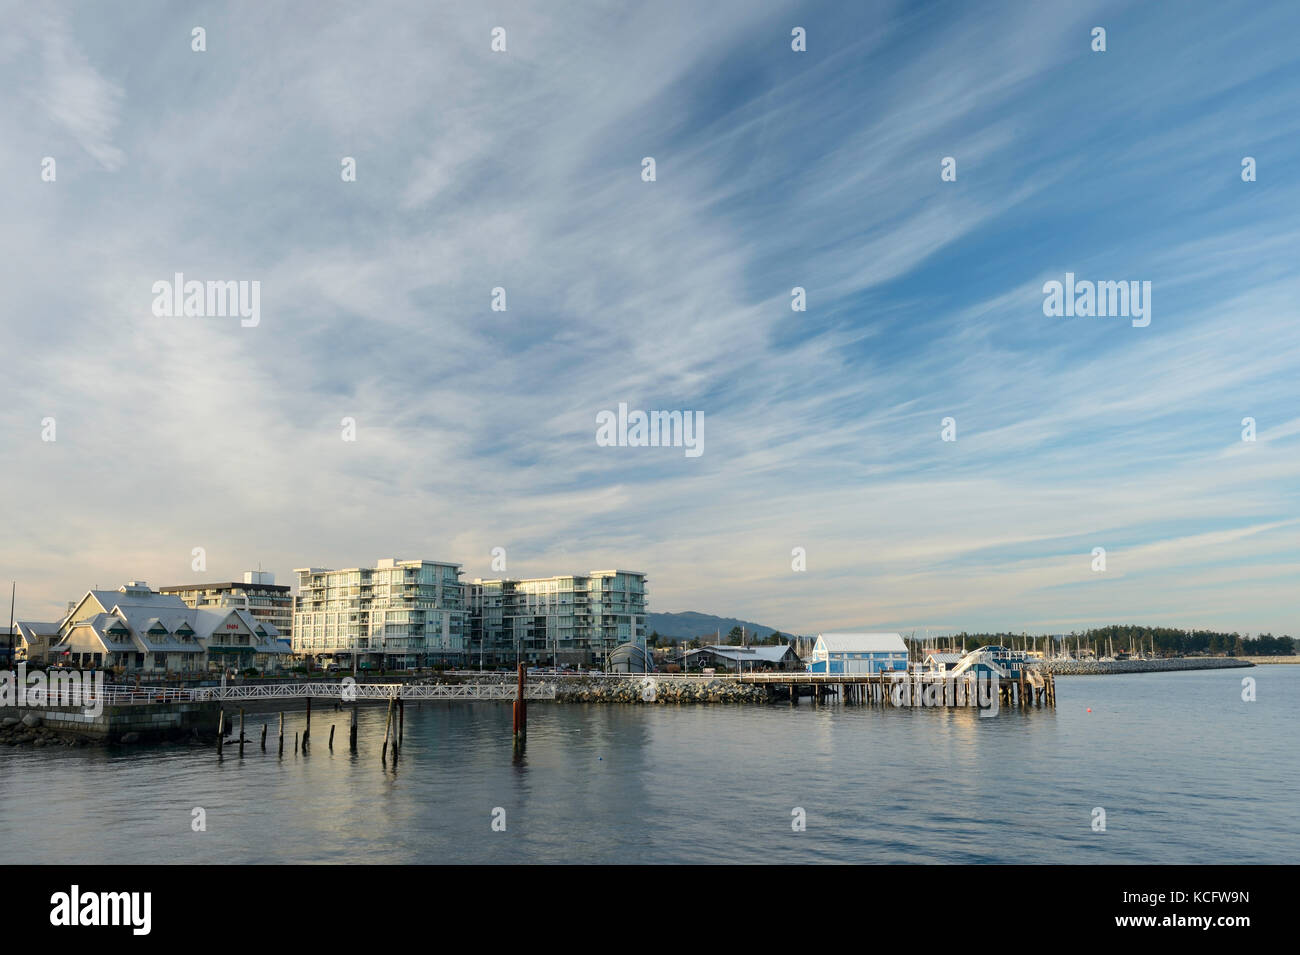 Sidney Pier Hotel, Sidney, BC Canada - Stock Image